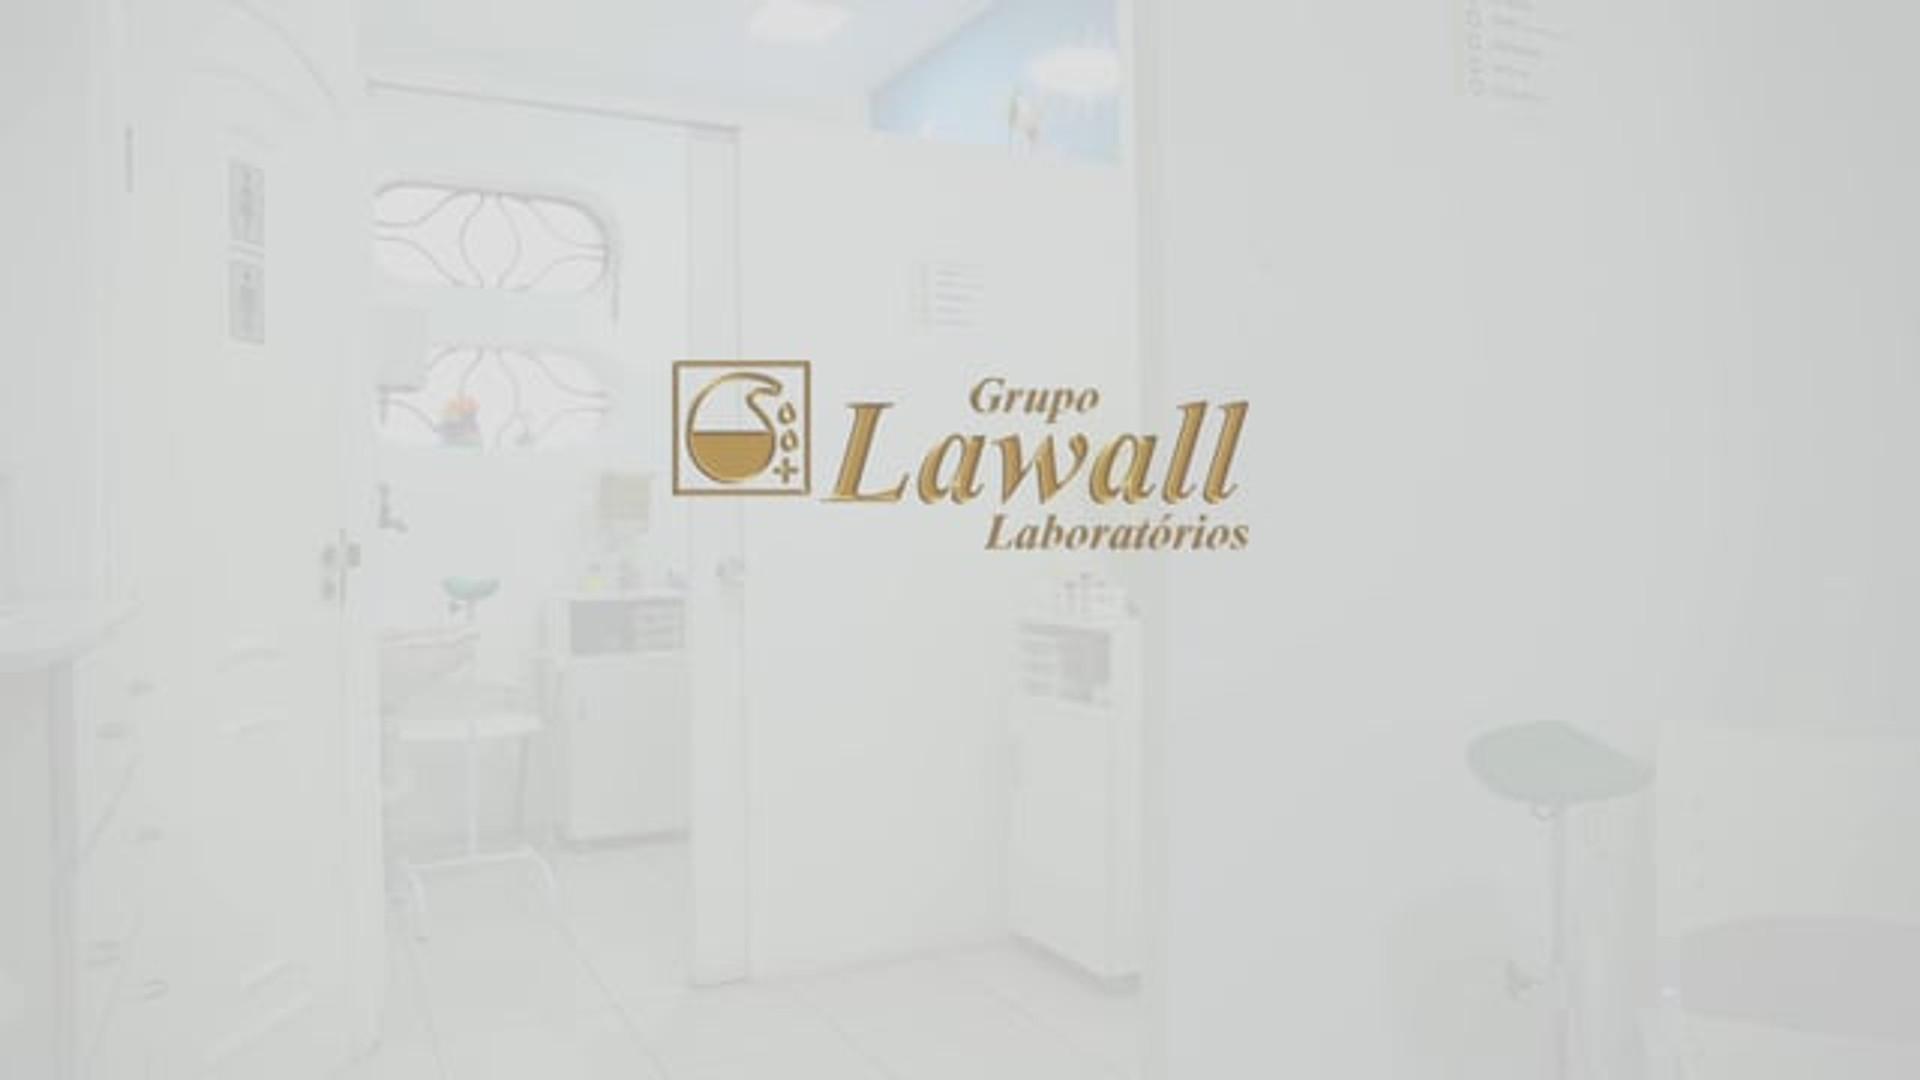 VT Grupo Lawall Laboratórios